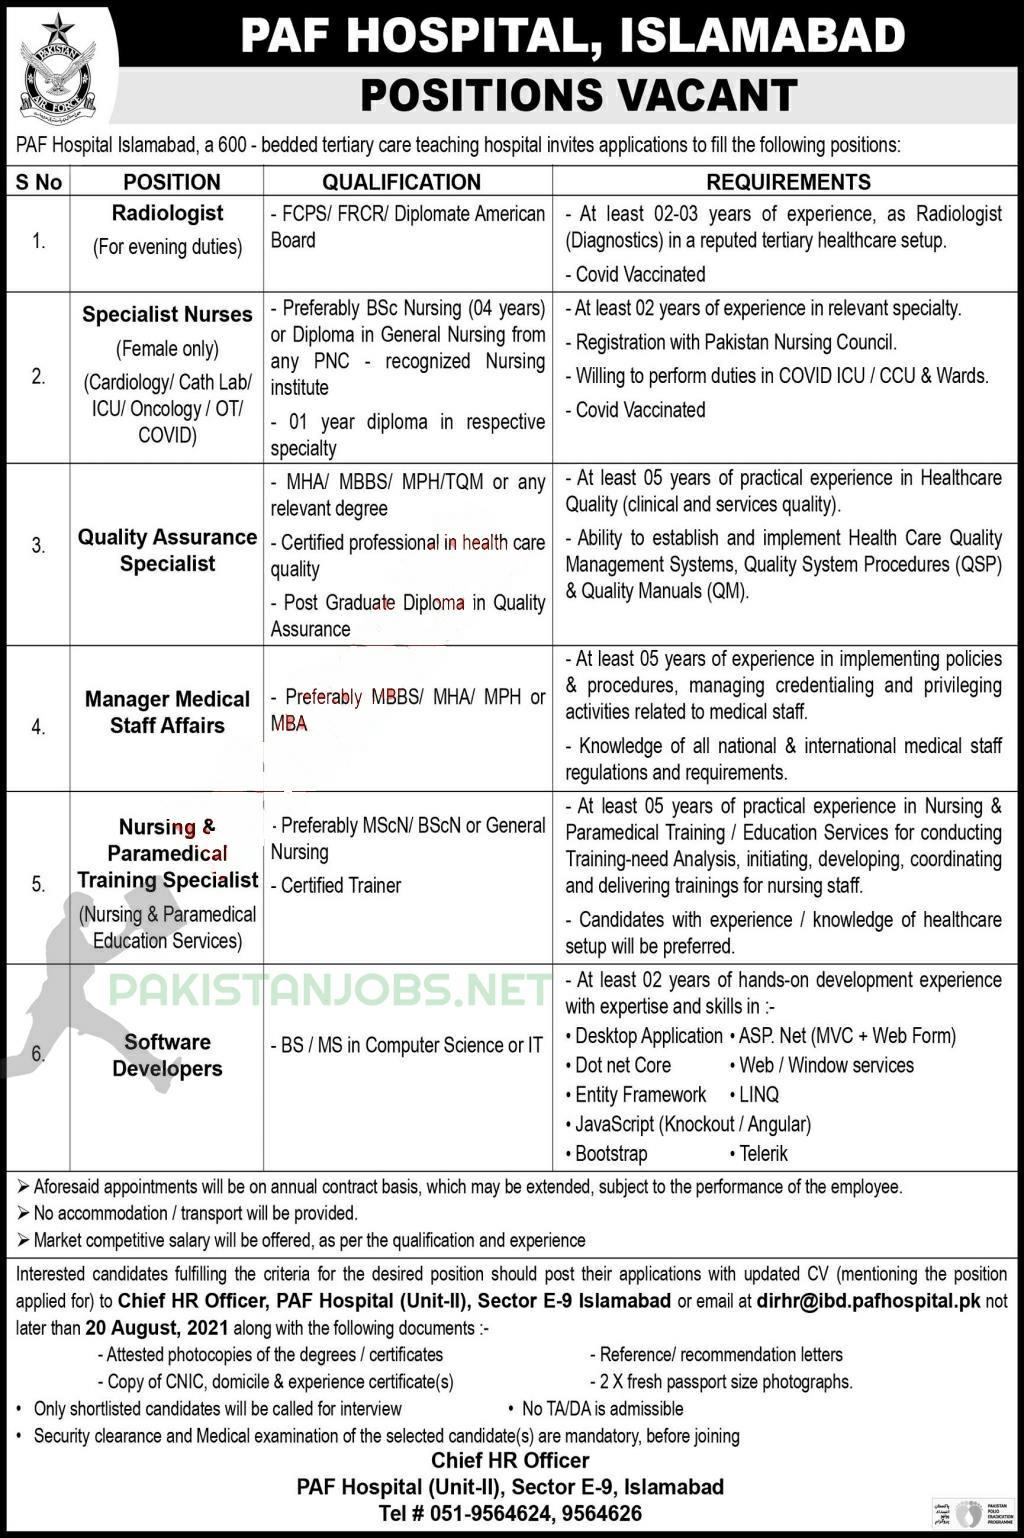 PAF Hospital Job Updates 2021 Latest